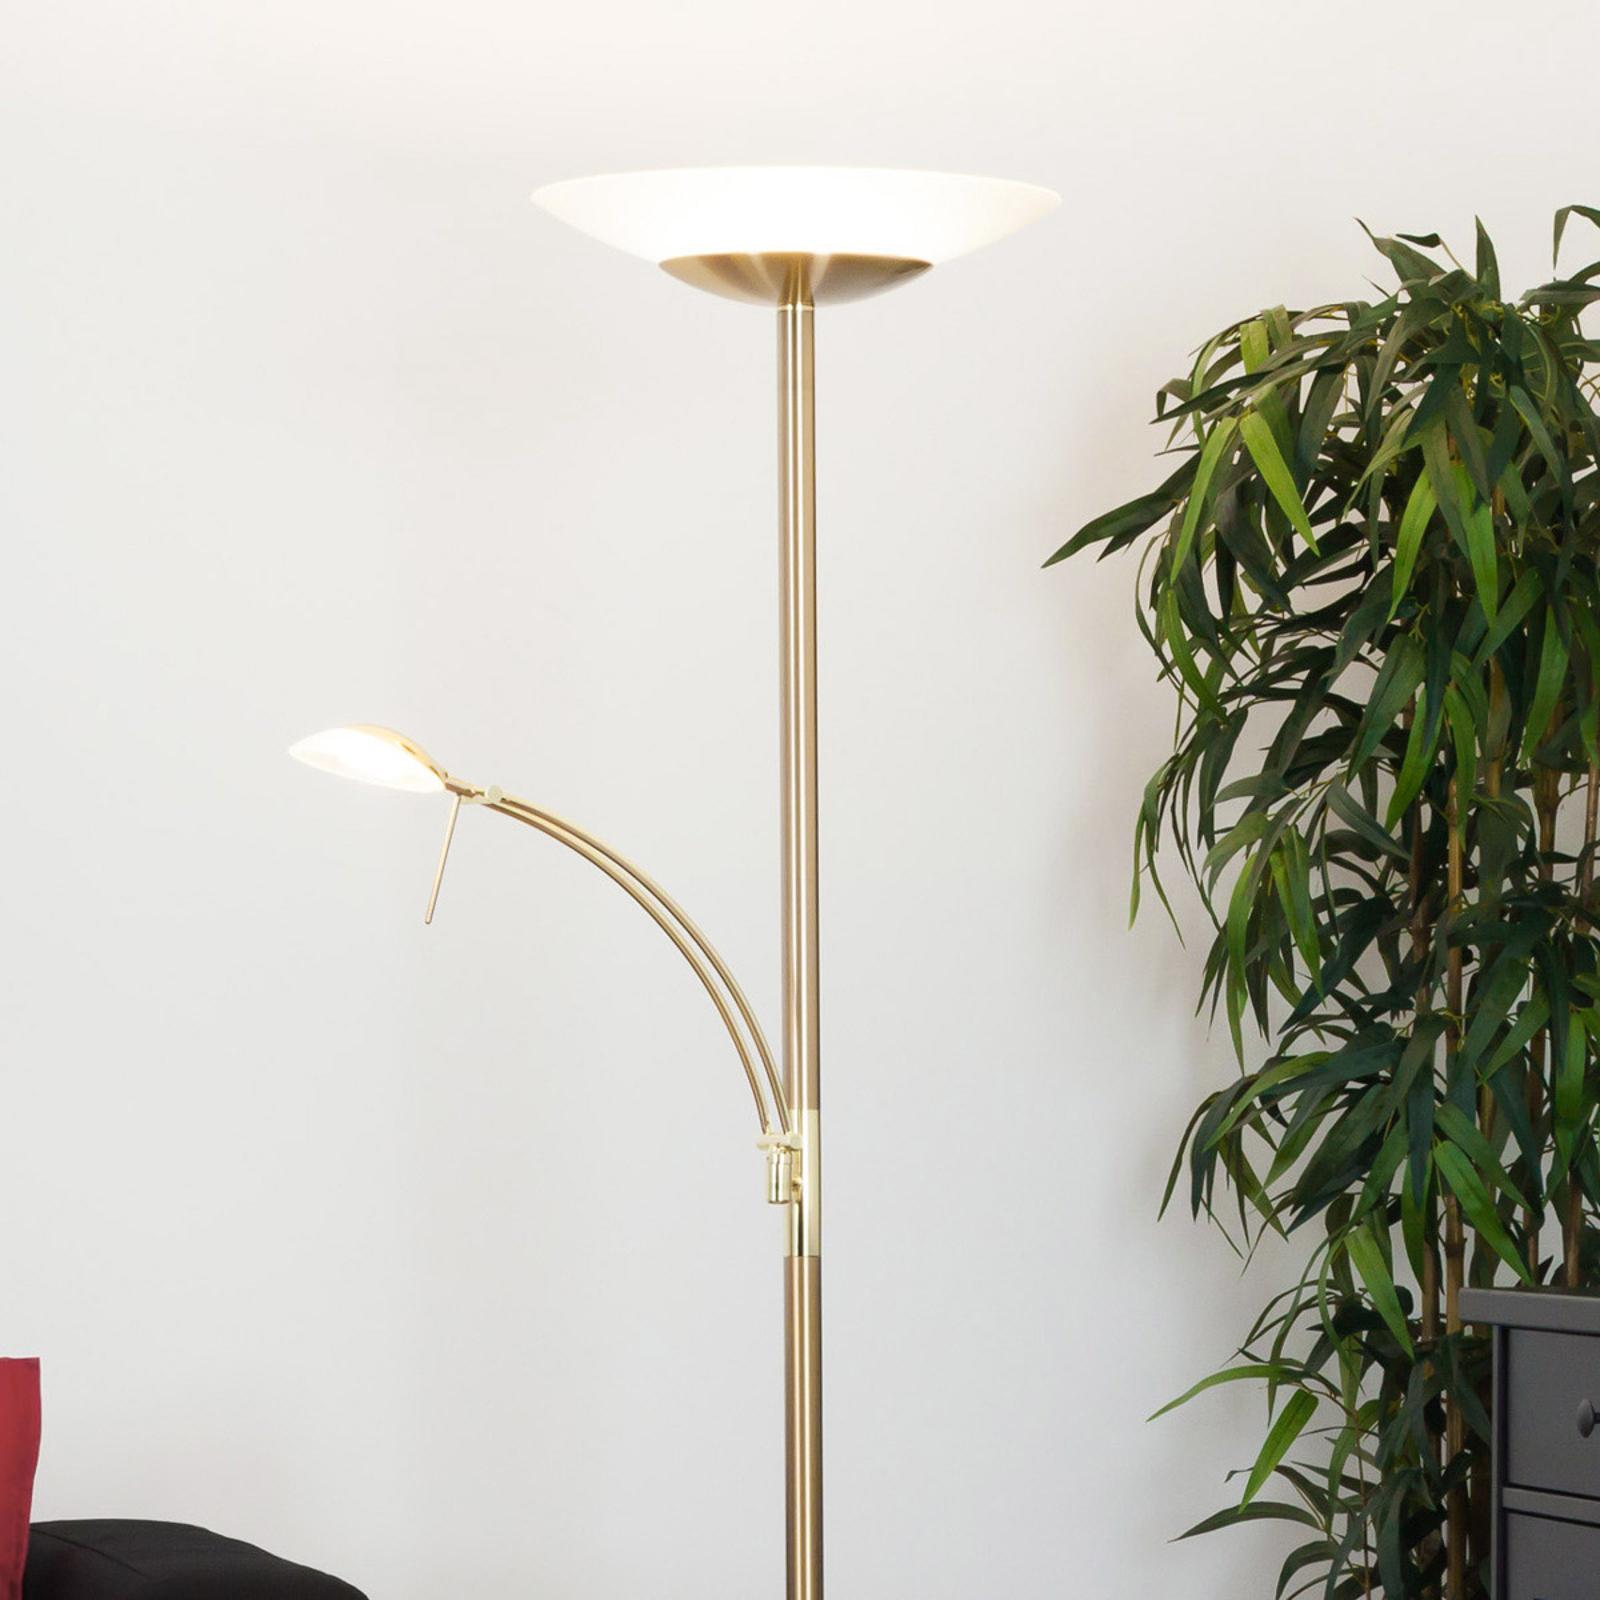 Messingfarbene LED-Stehlampe Ilinca mit Leselicht